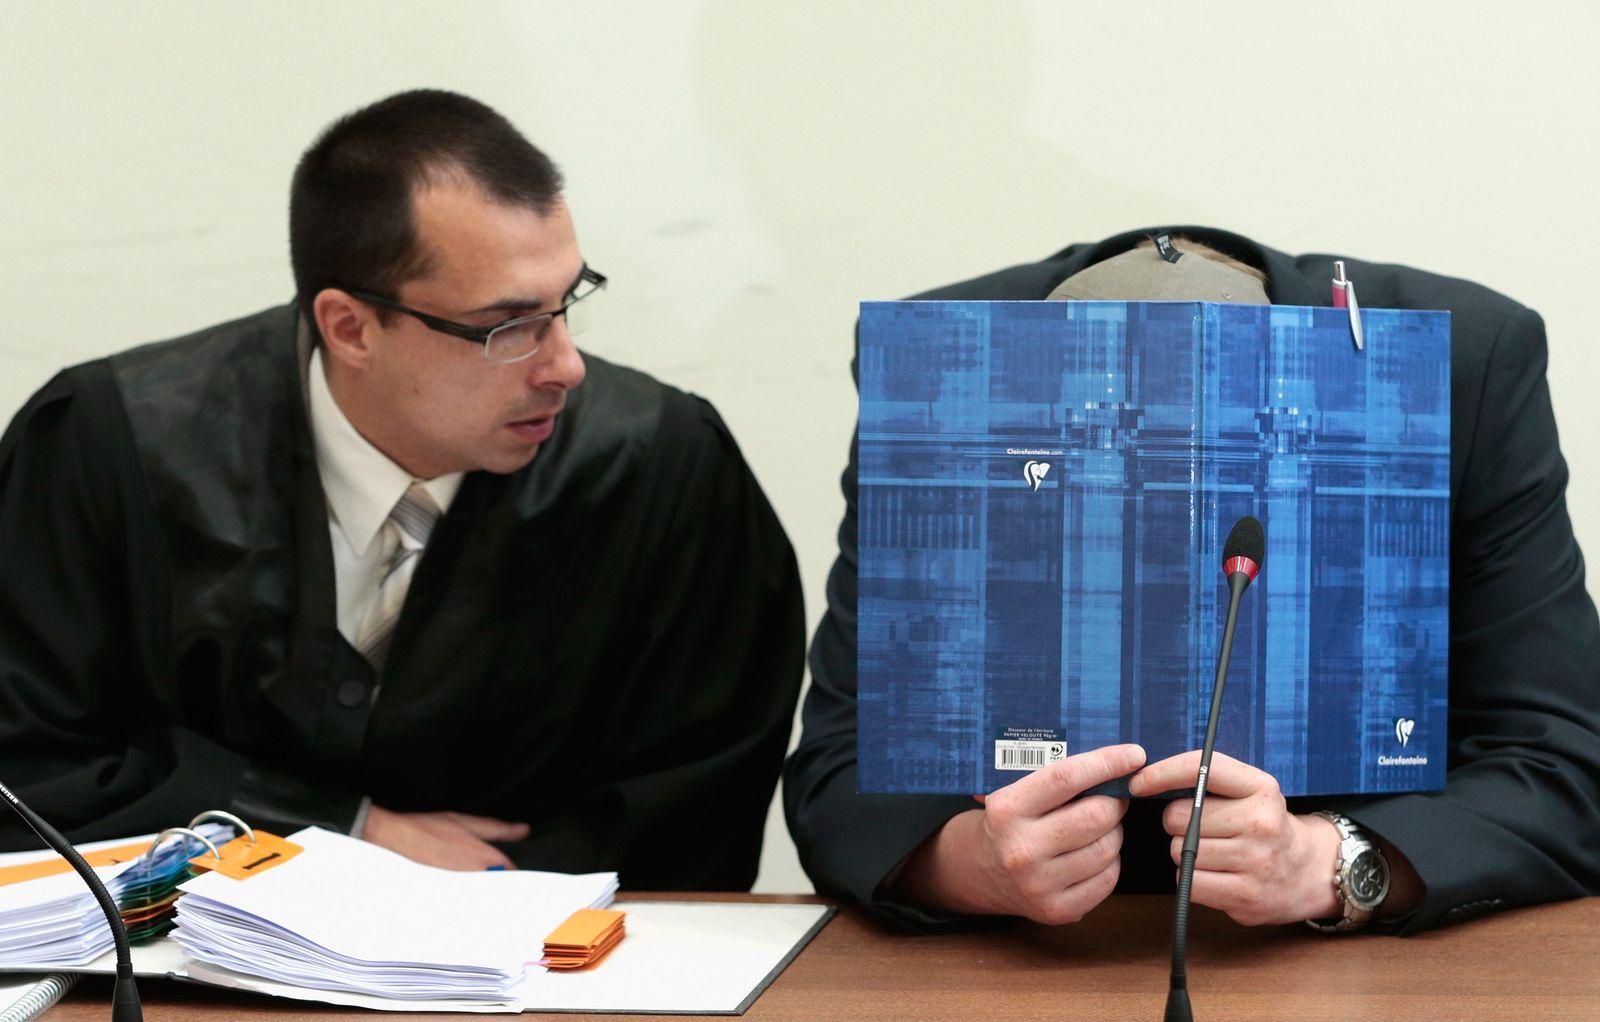 Holger G. NSU Trial